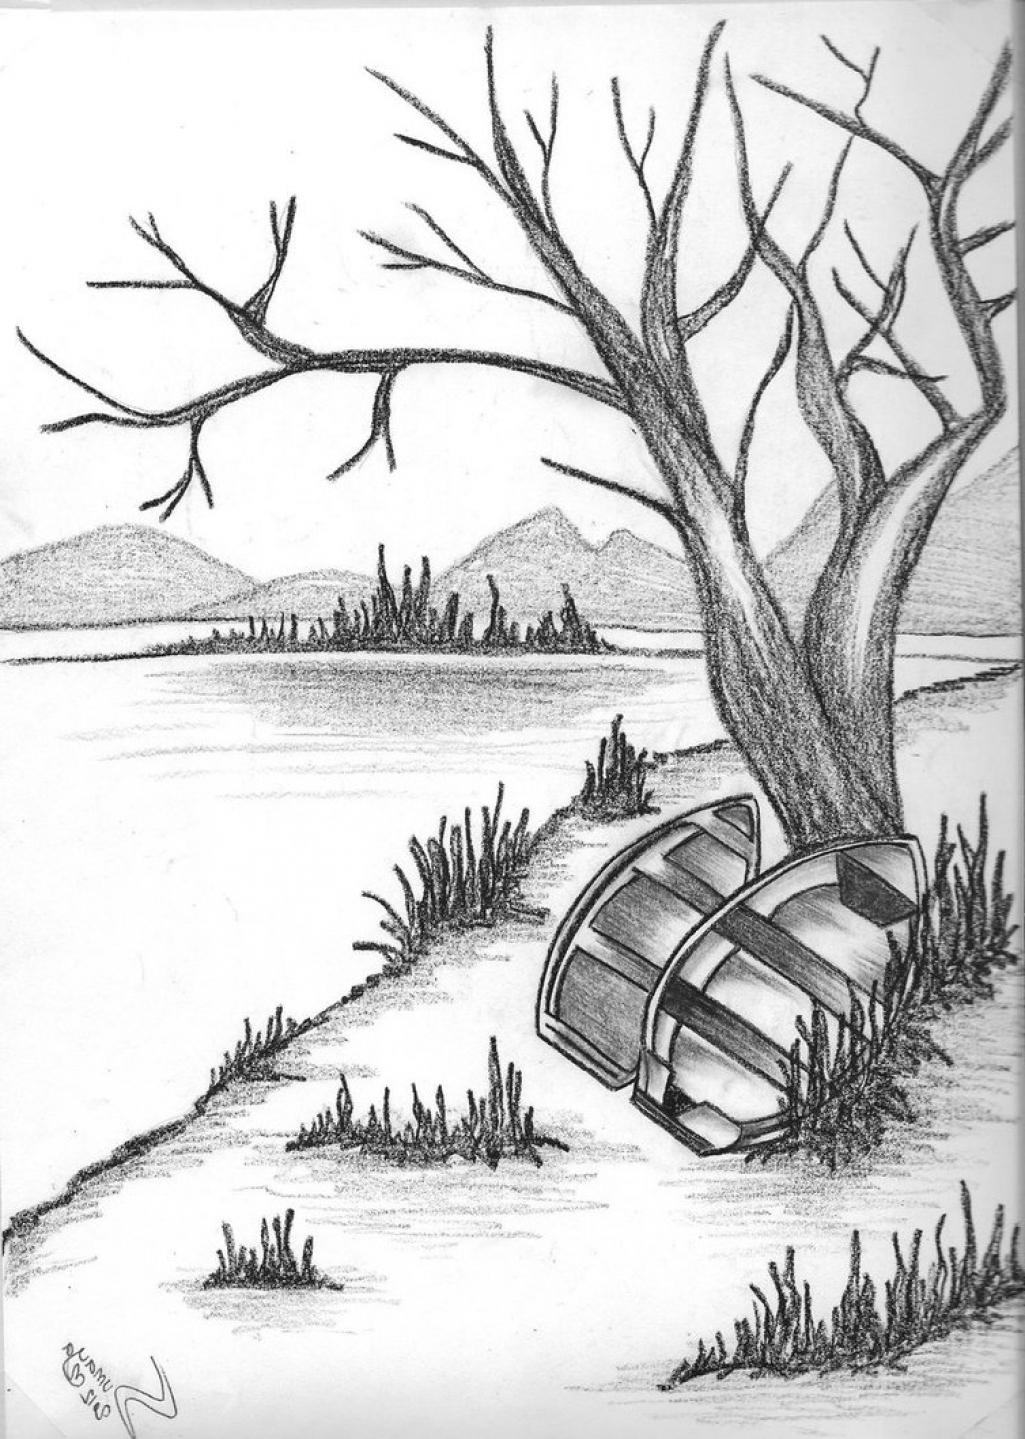 1025x1439 Pencil Sketches Of Nature Summer Scenery Cross The Bridgemountain